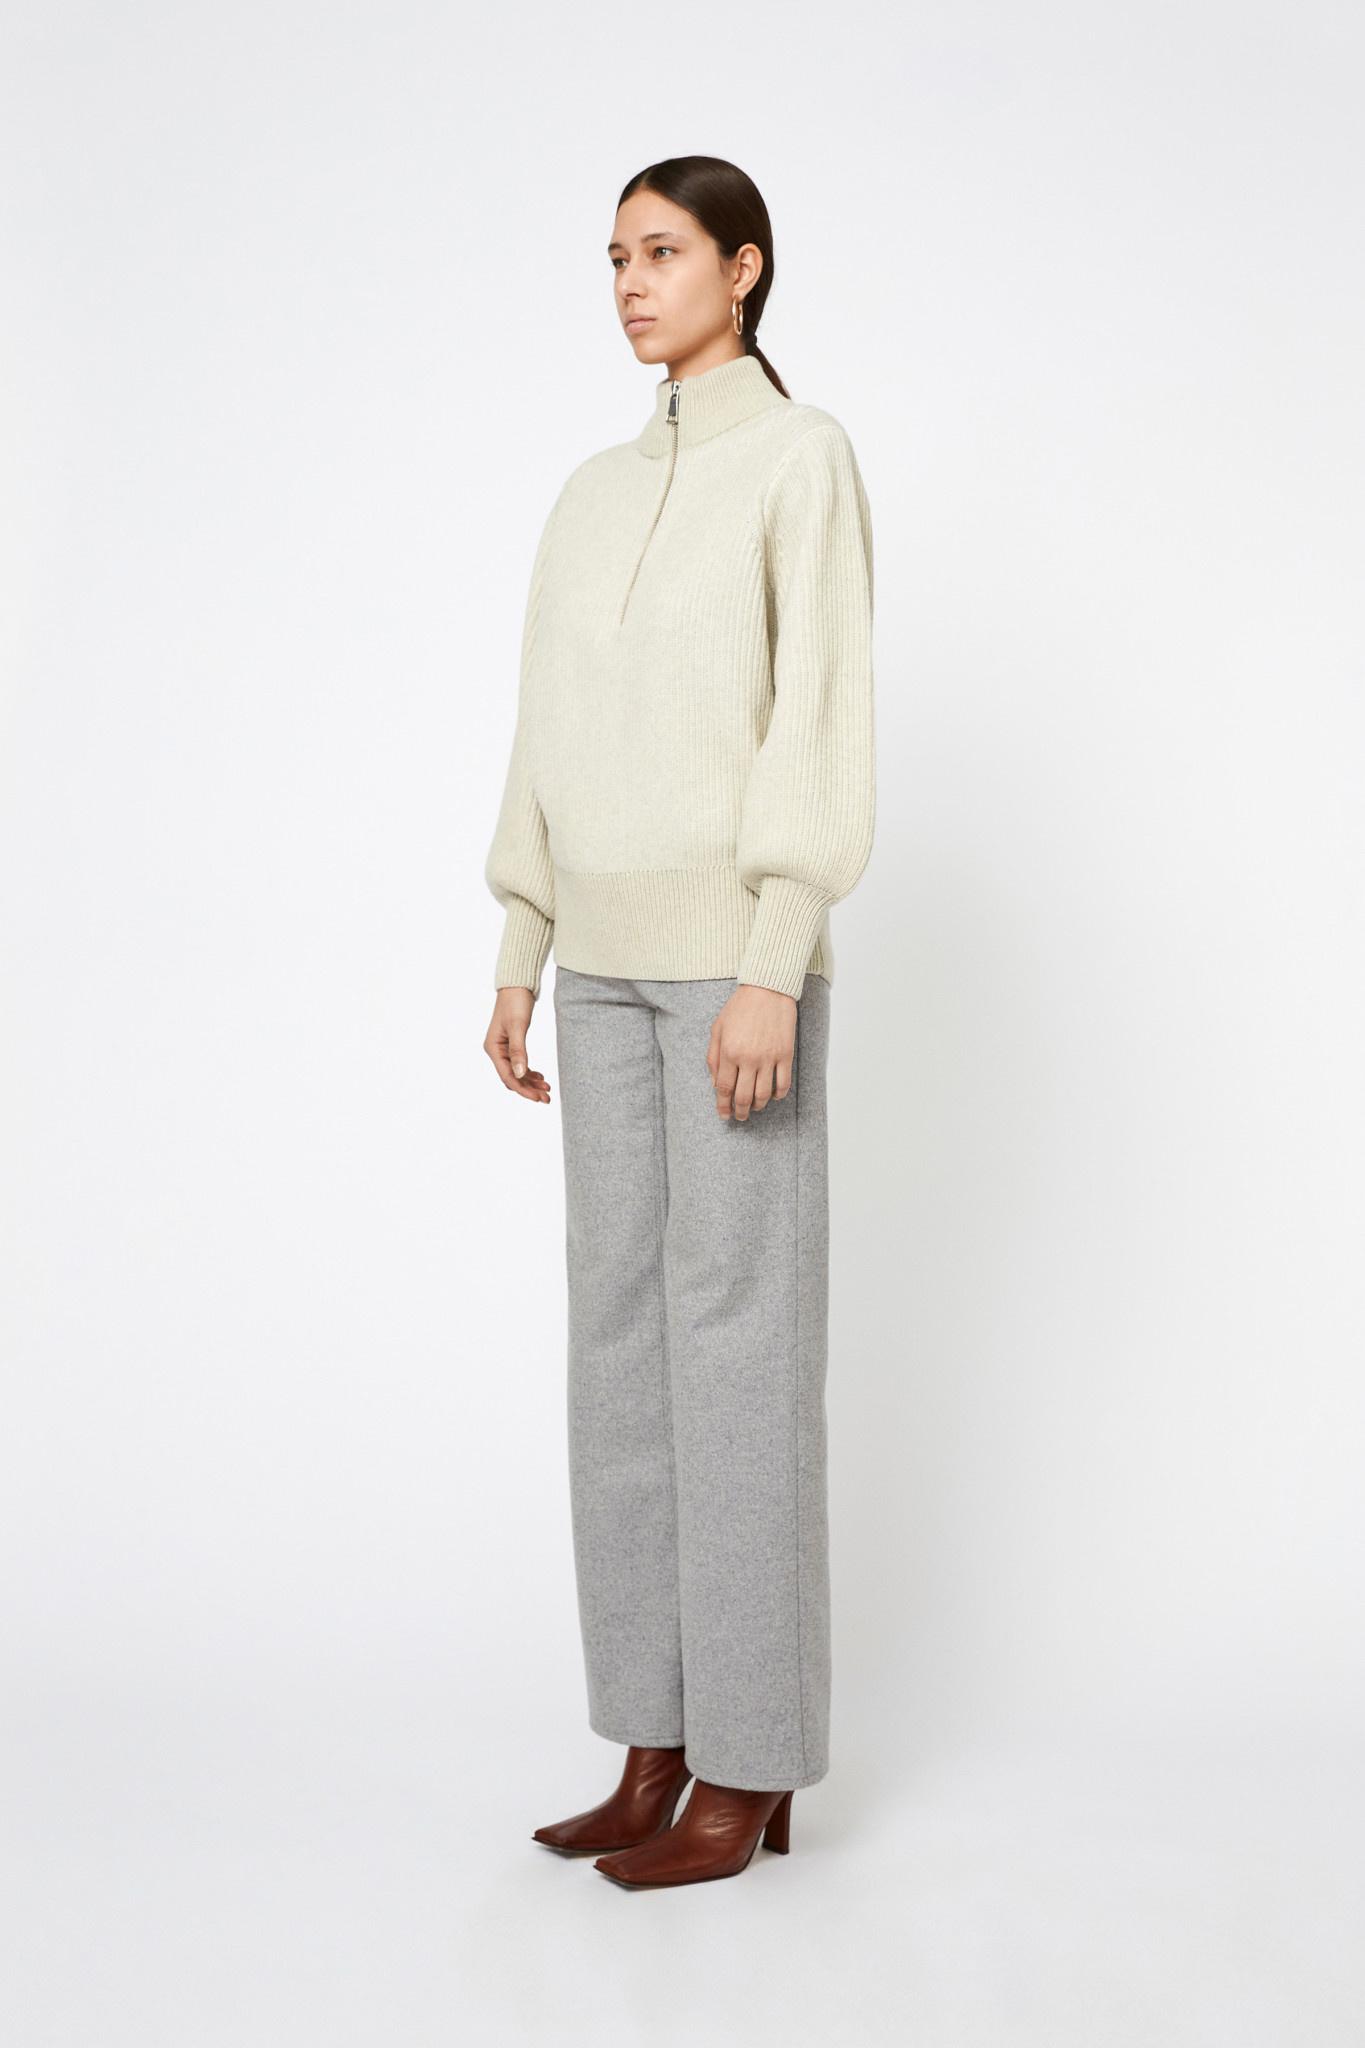 Delaney Merino Wool Longsleeve - Cream-2